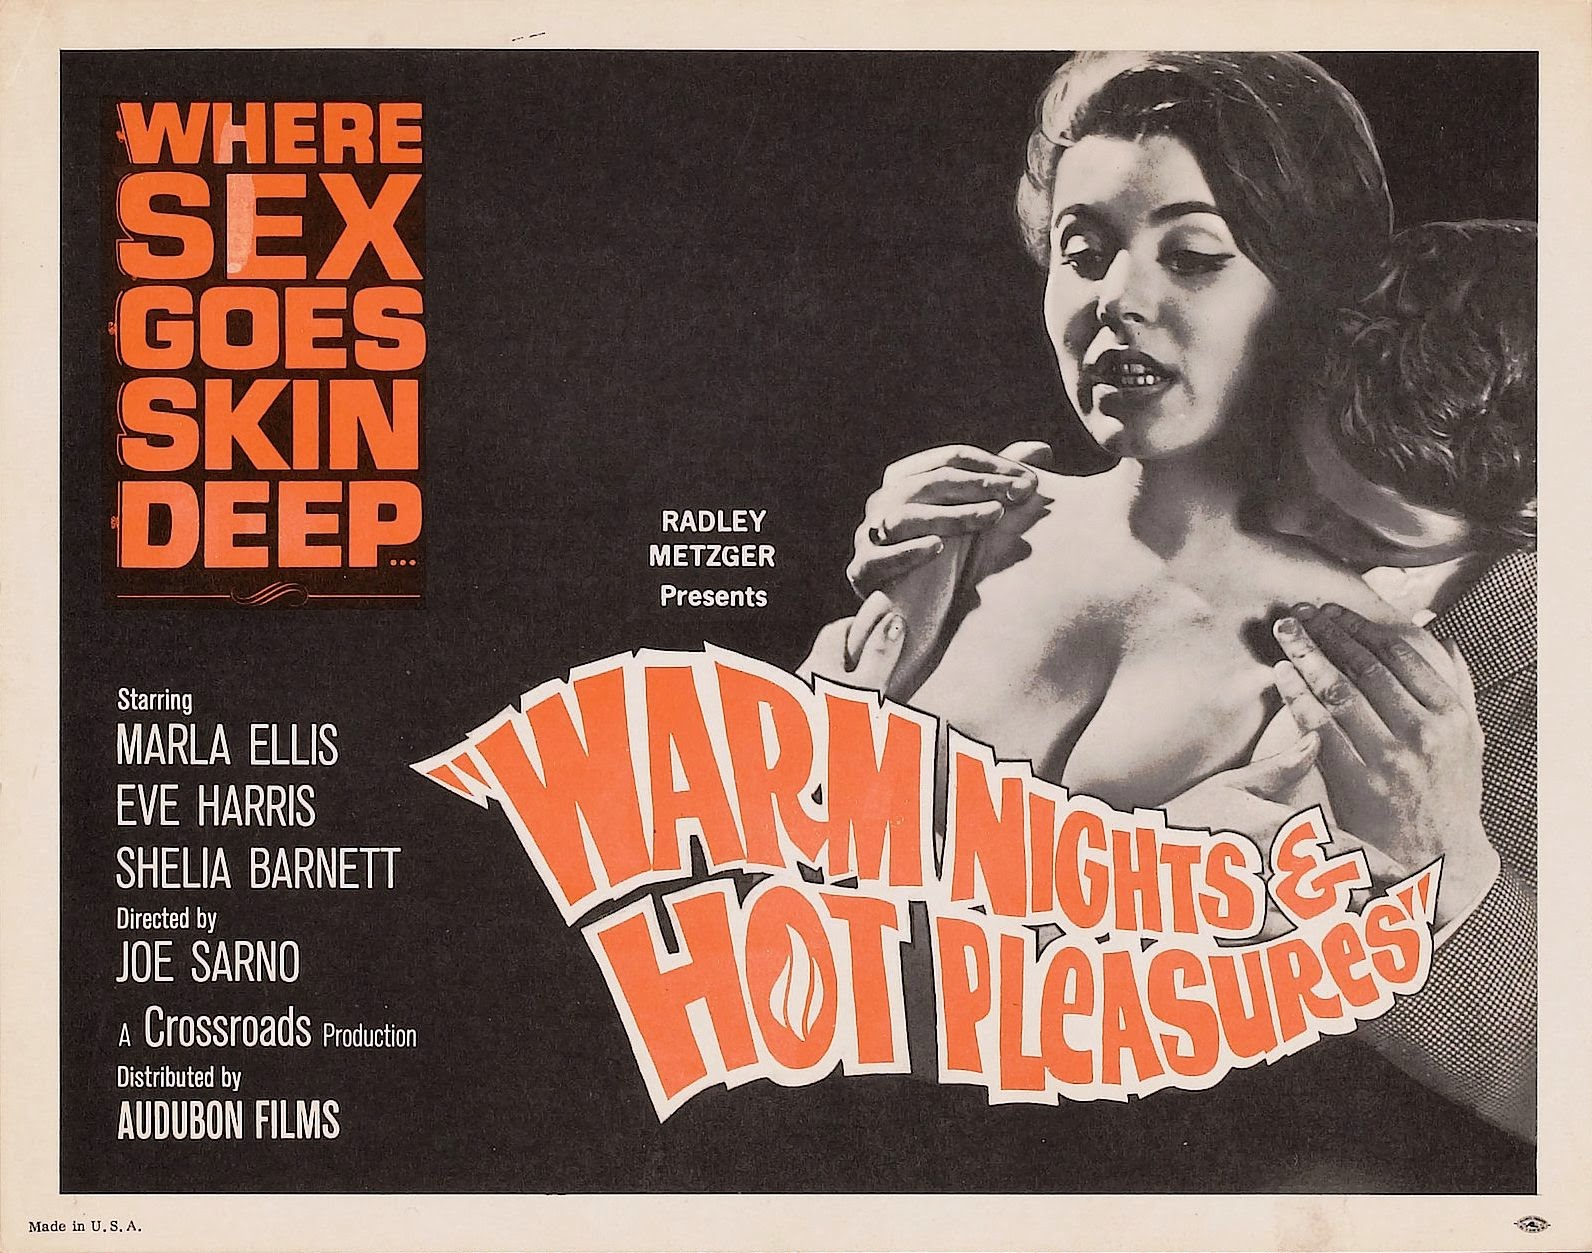 warm-nights-hot-pleasures